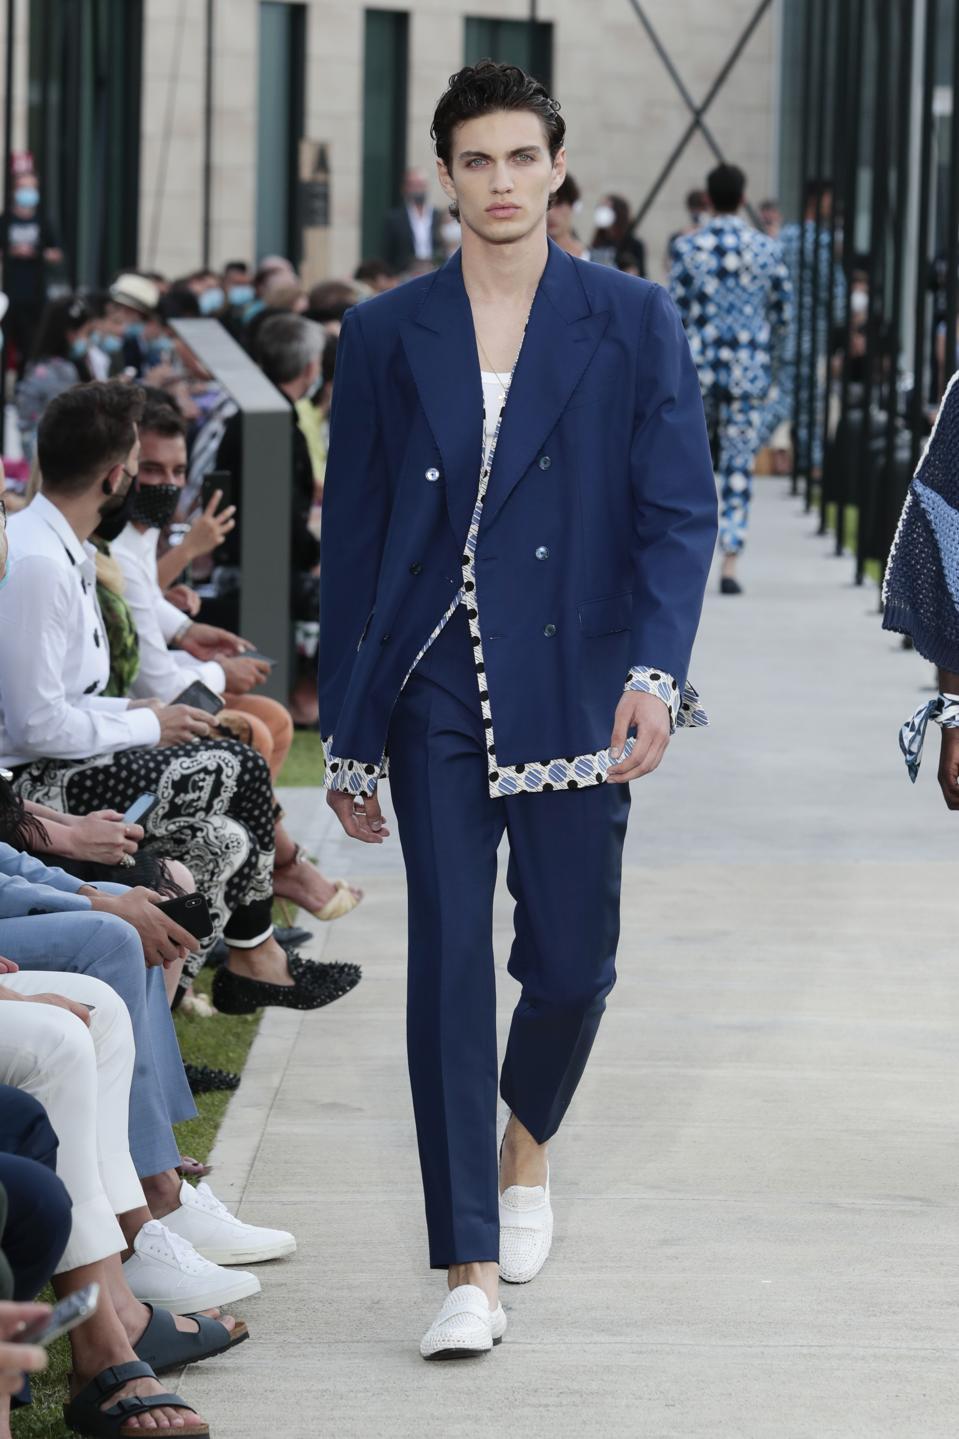 Dolce&Gabbana Spring/Summer 2021 look